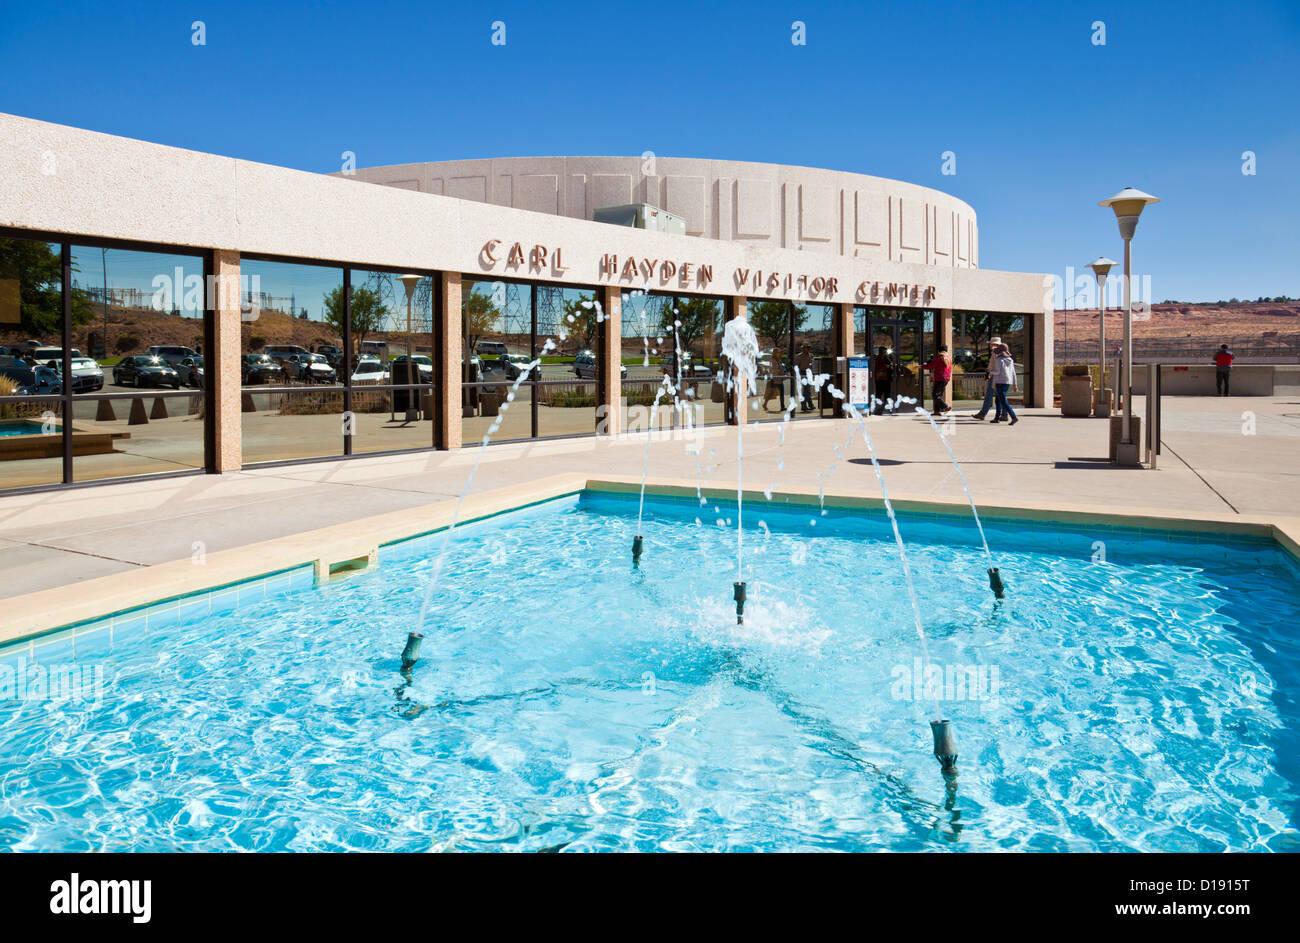 Carl Hayden Visitor Centre at Glen Canyon Dam, near Page, Arizona, United States of America, North America - Stock Image